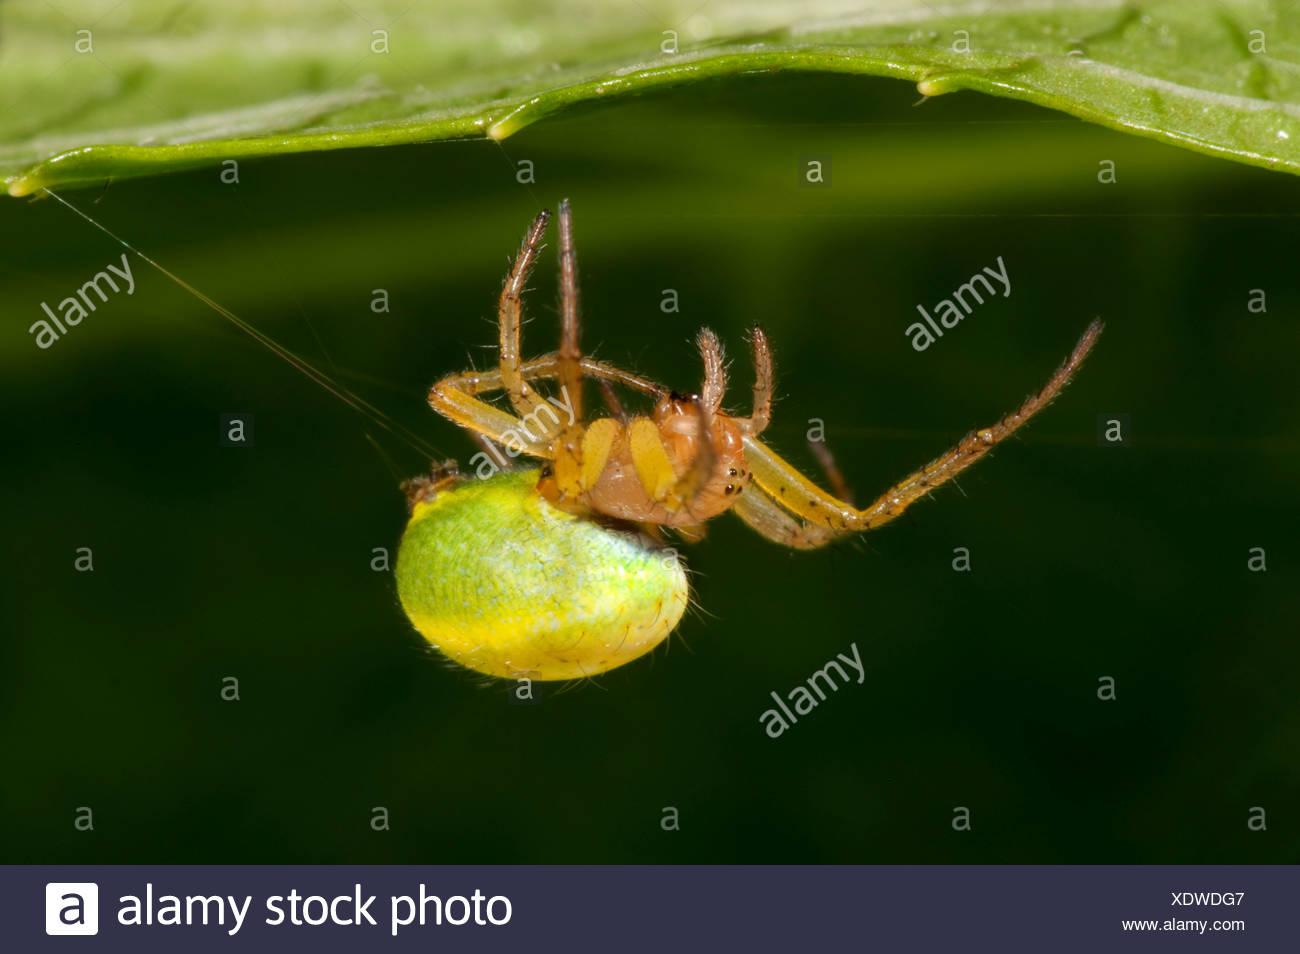 Cucumber or Green Orb Weaver Spider Araniella cucurbitina spinning web under leaf in garden bright green abdomen - Stock Image